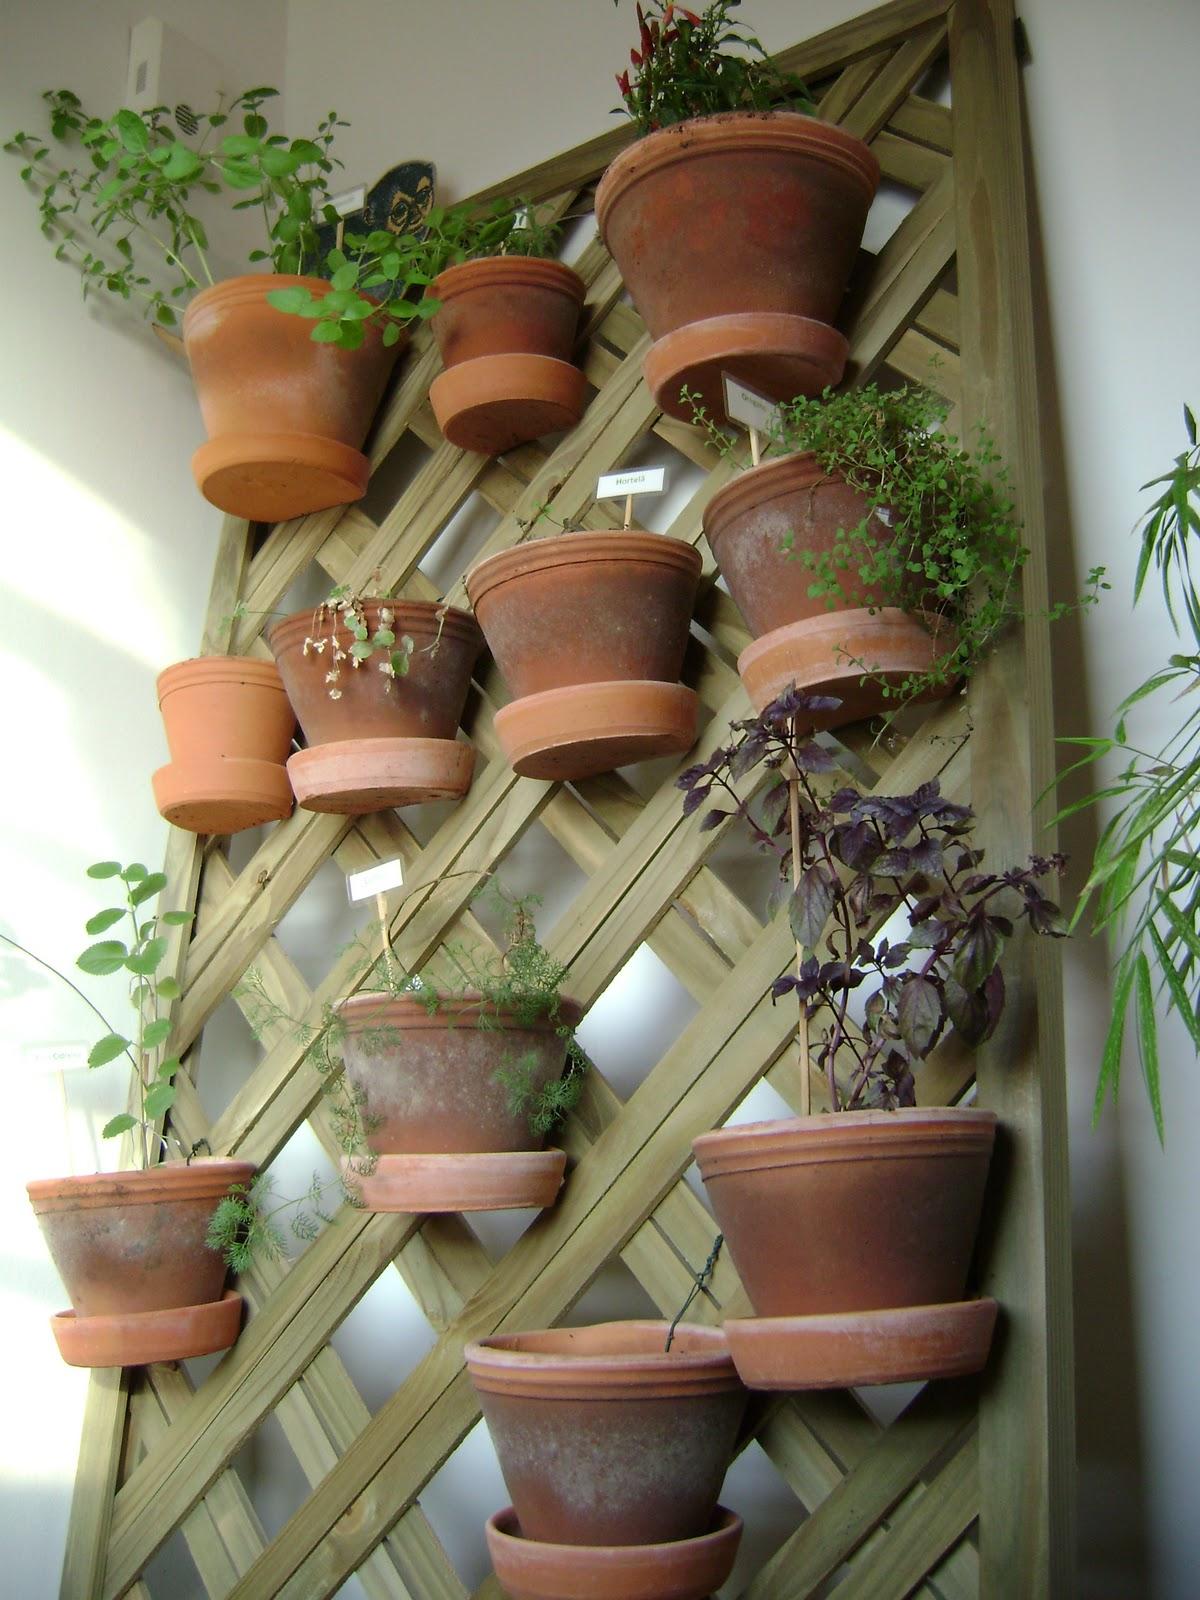 jardim vertical vasos meia lua : jardim vertical vasos meia lua:Pree Power . mix: Horta em apartamento